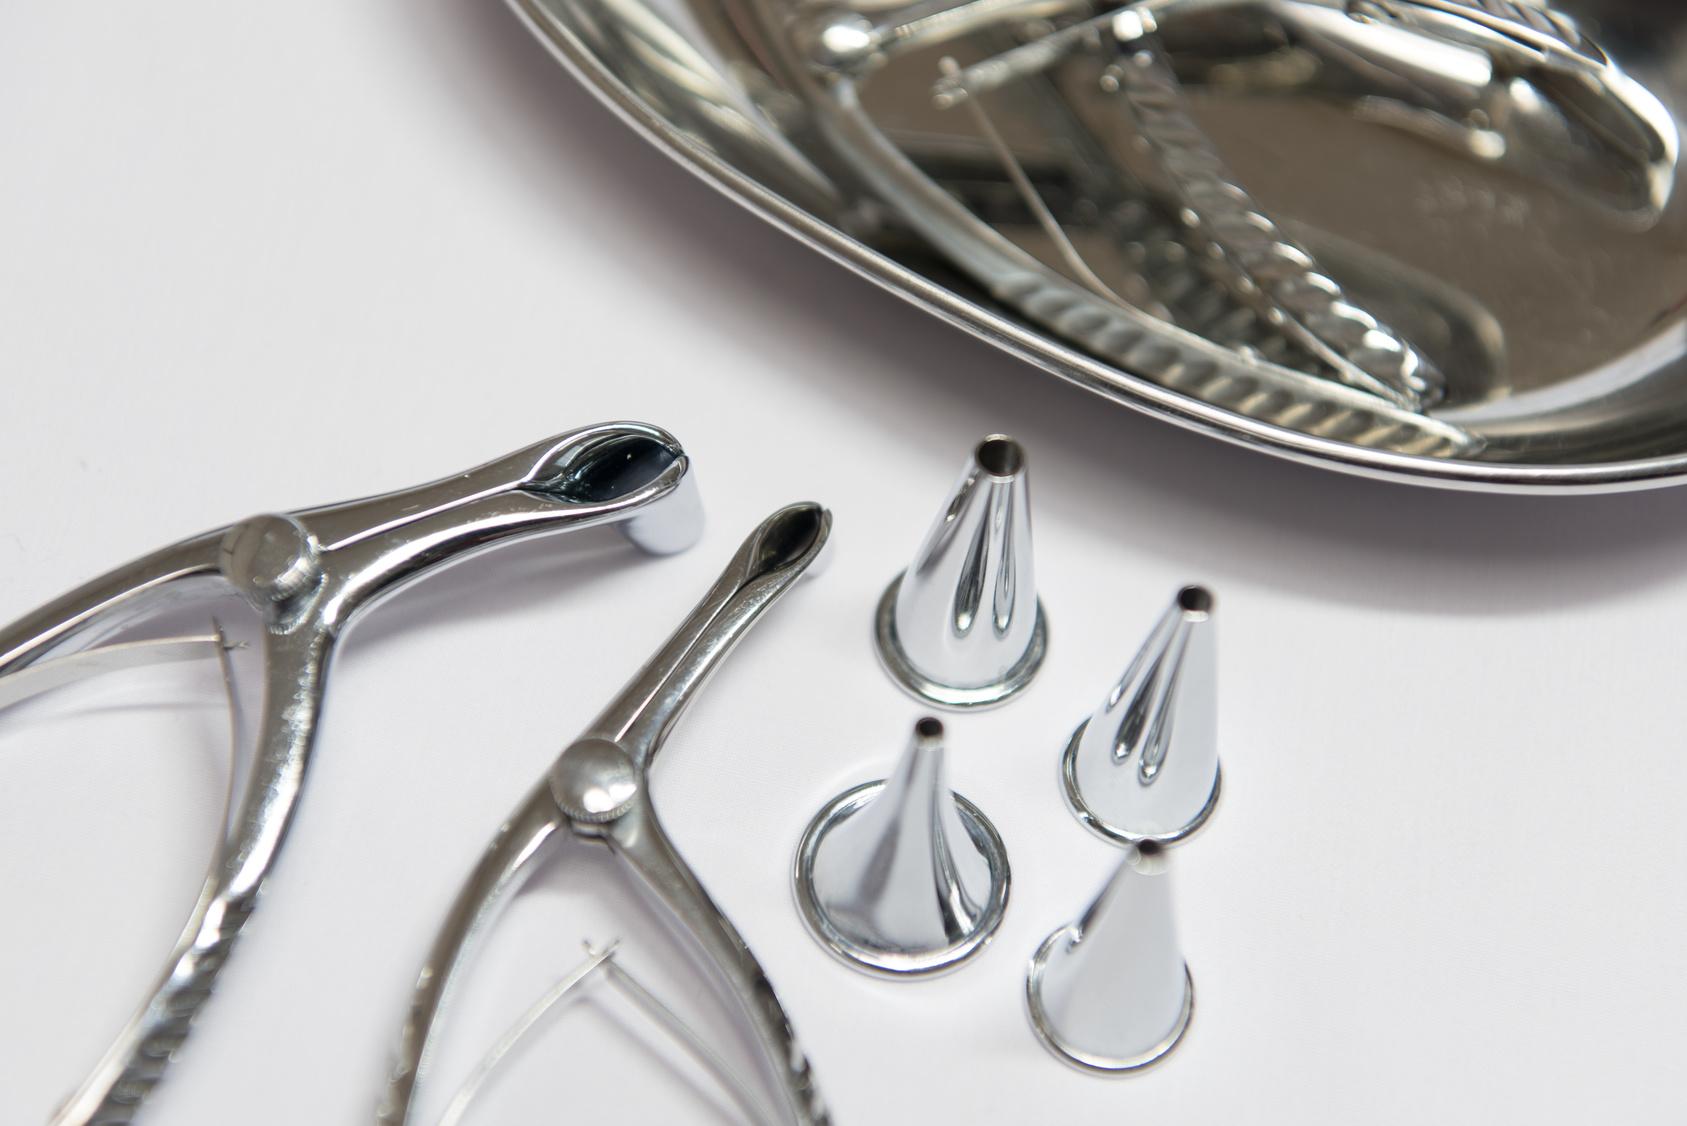 耳鼻科の診療器具、鼻鏡、耳鏡、膿盆